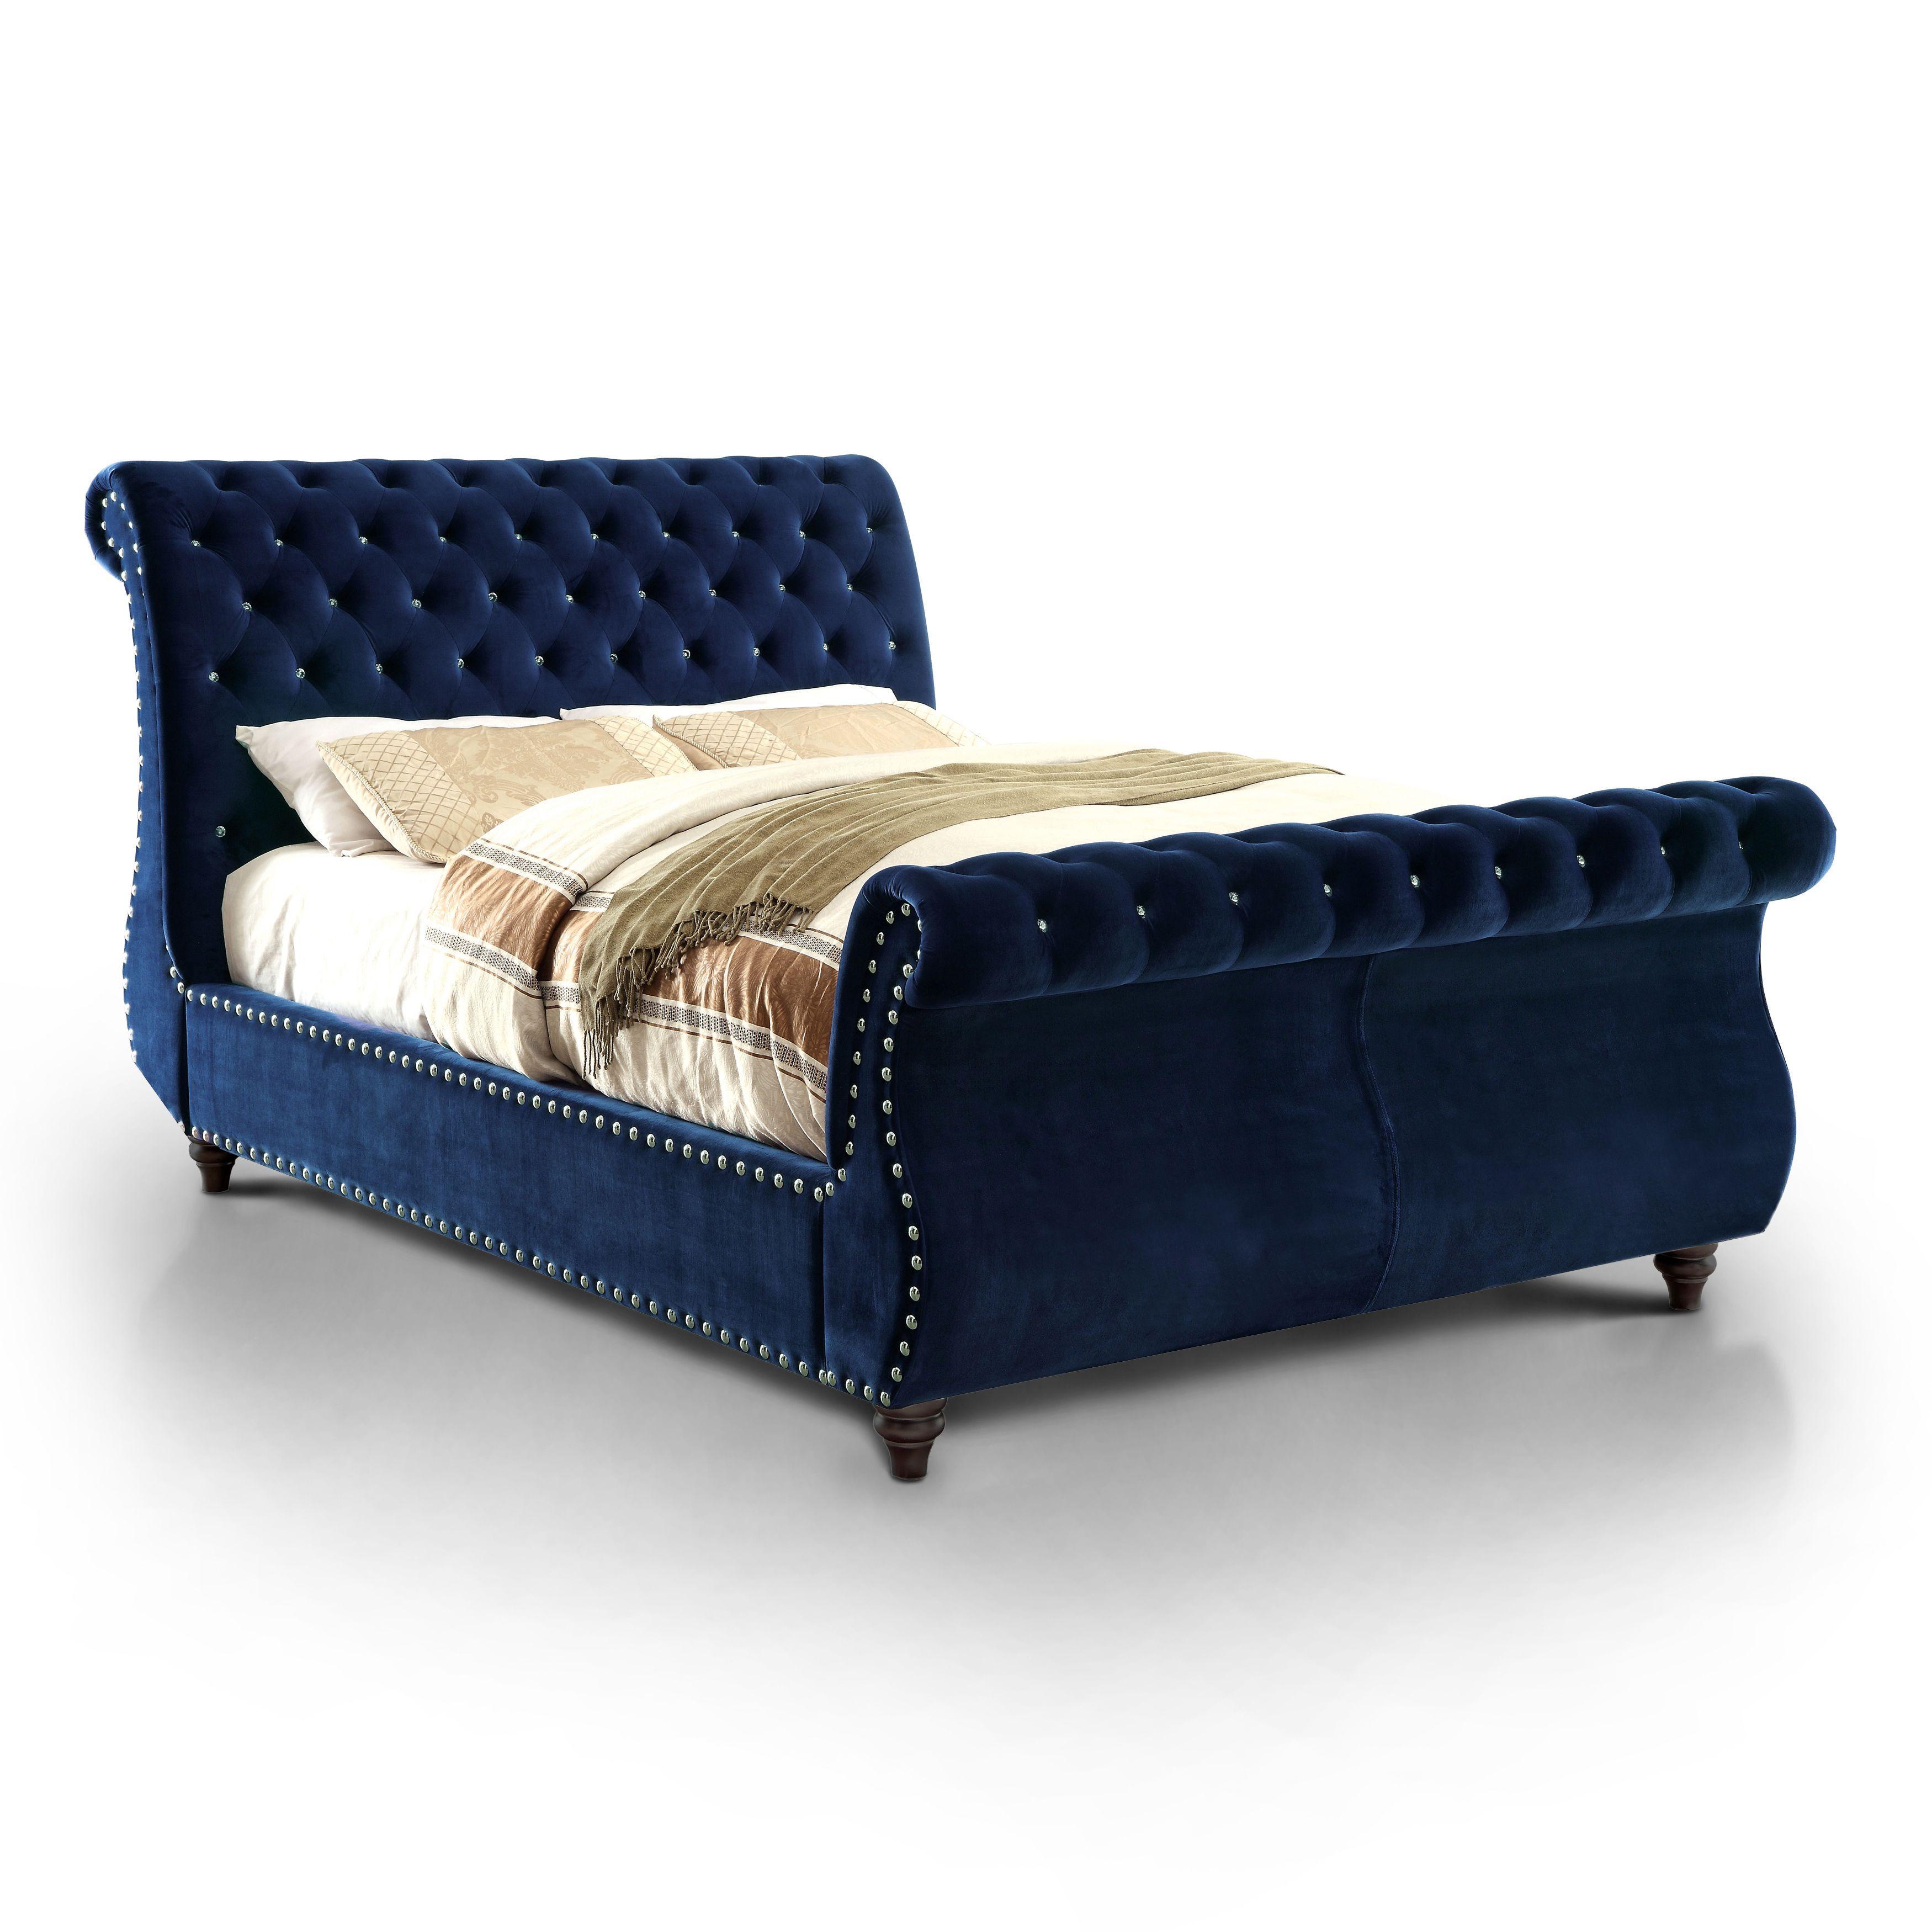 uk sleigh wayfair tatum co concept reviews upholstered loft bed home